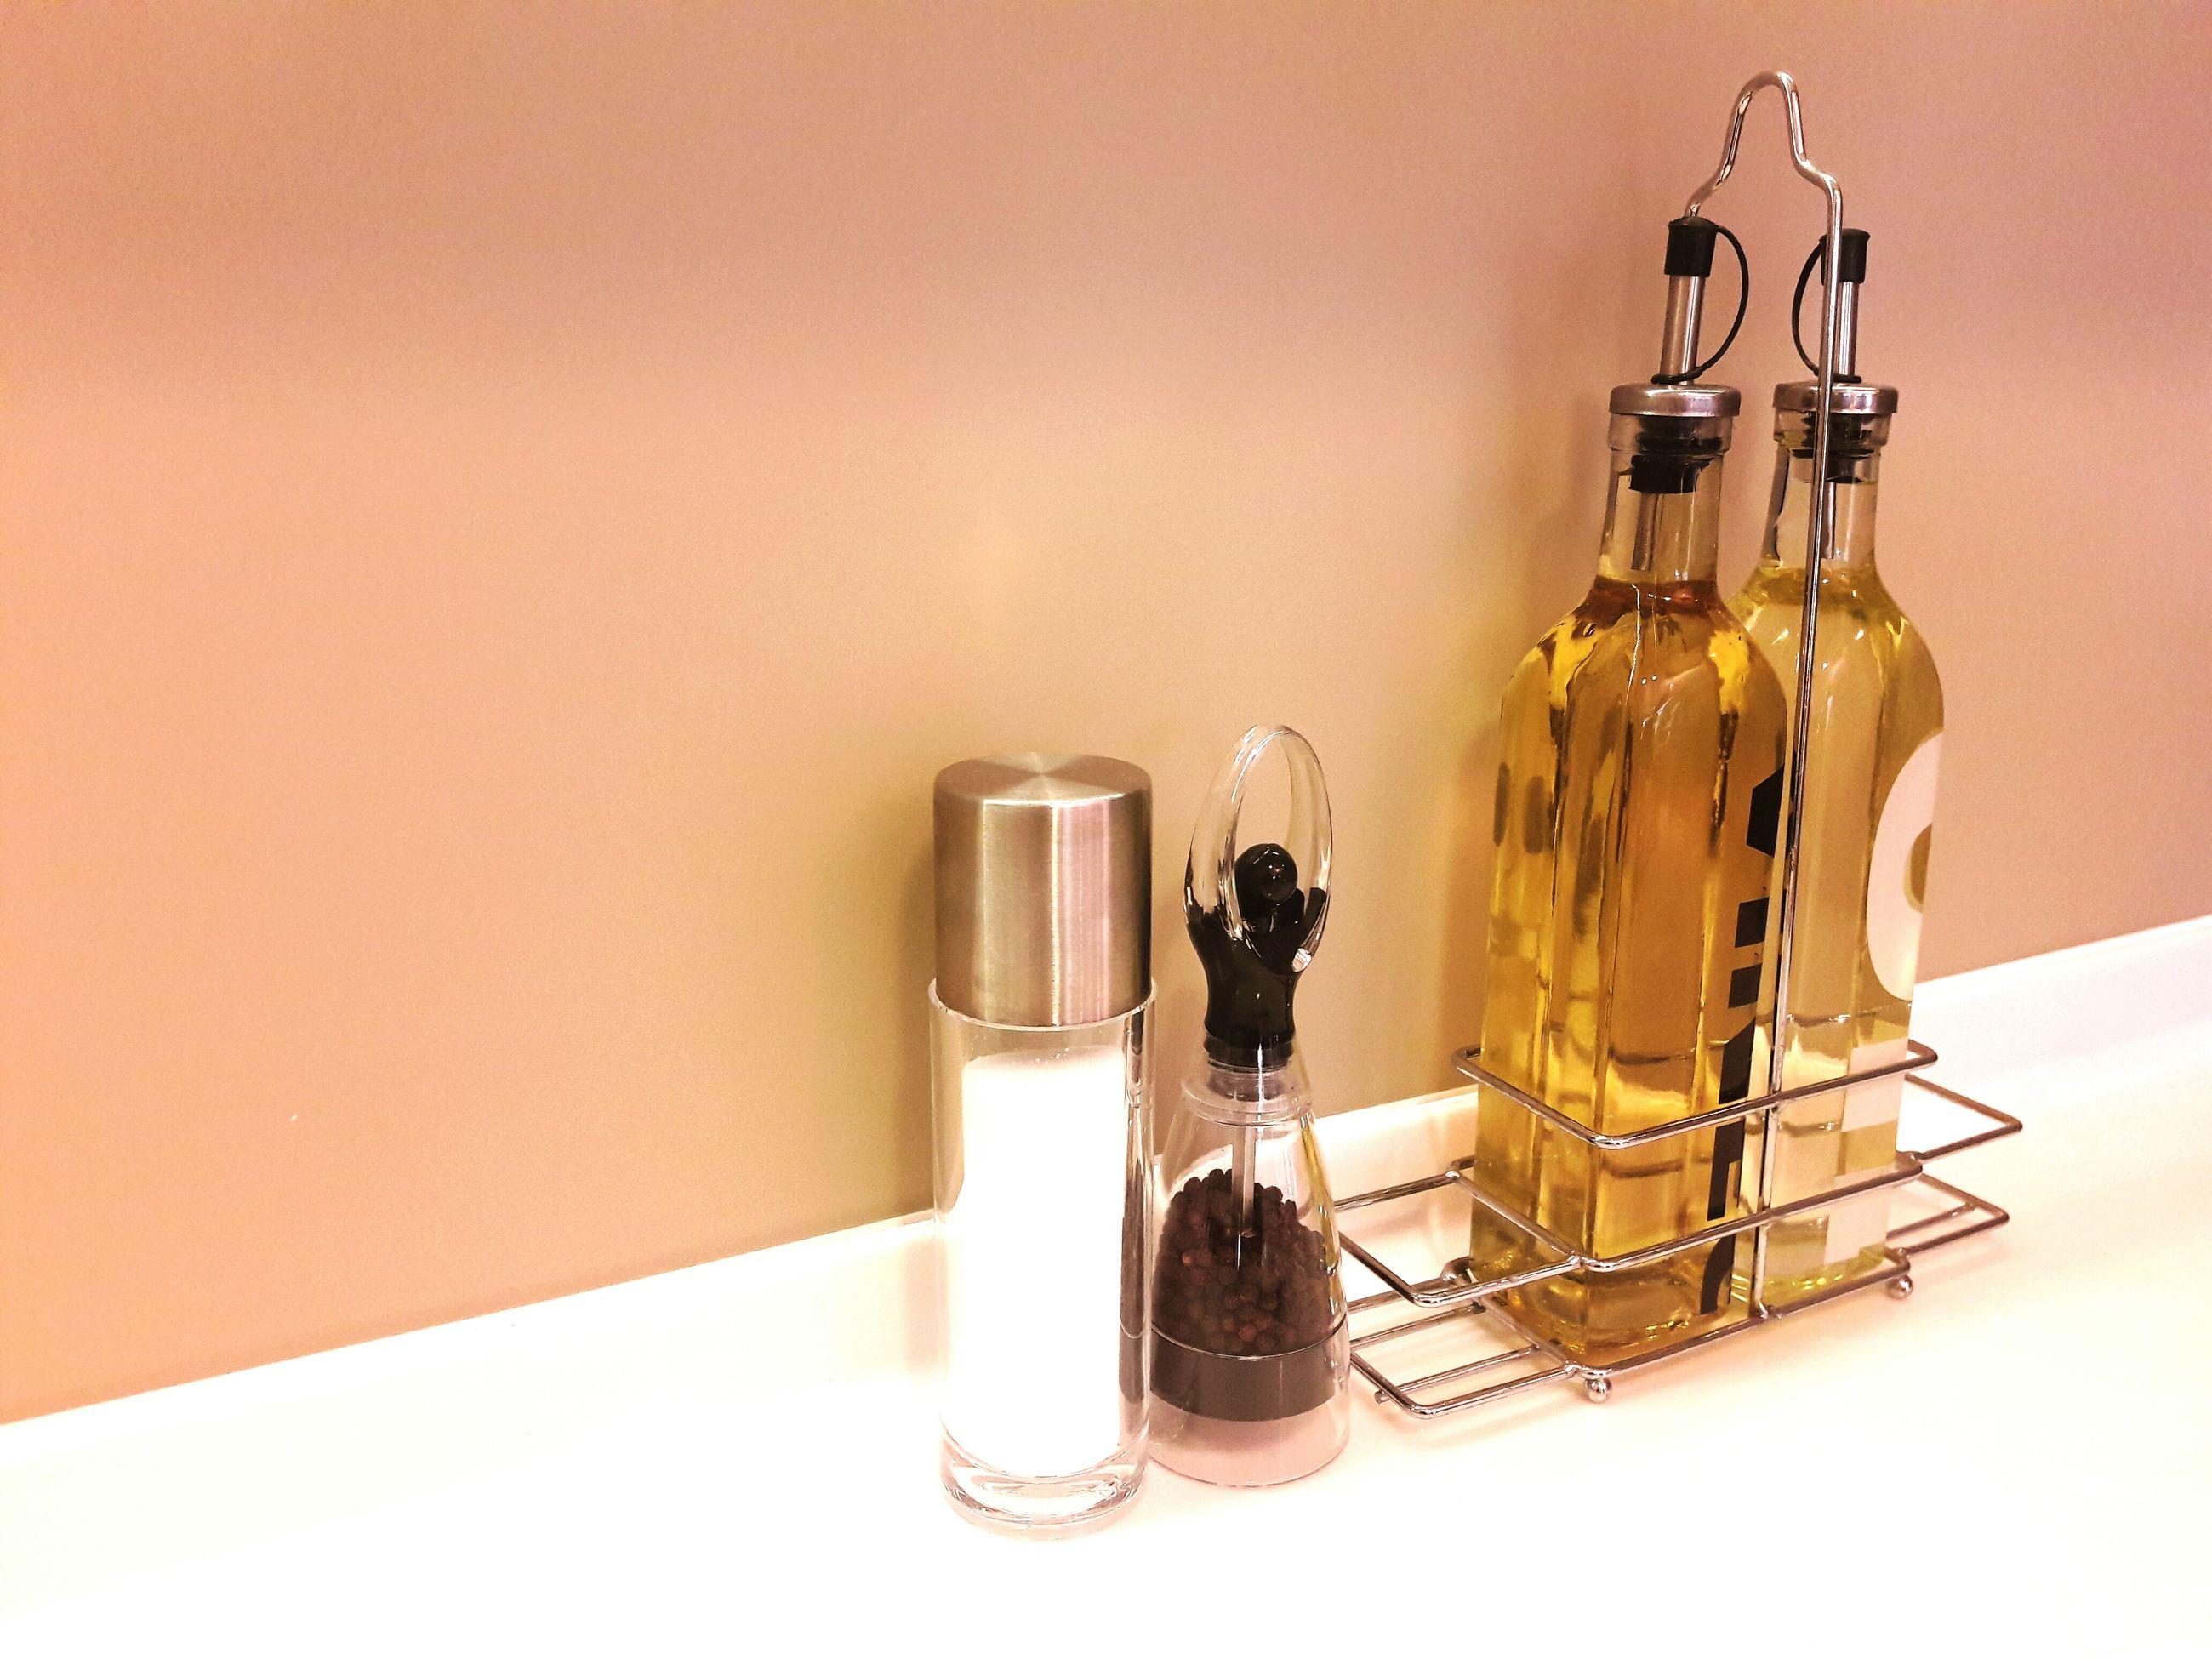 Olive oil in bottles by pepper and salt shaker on table